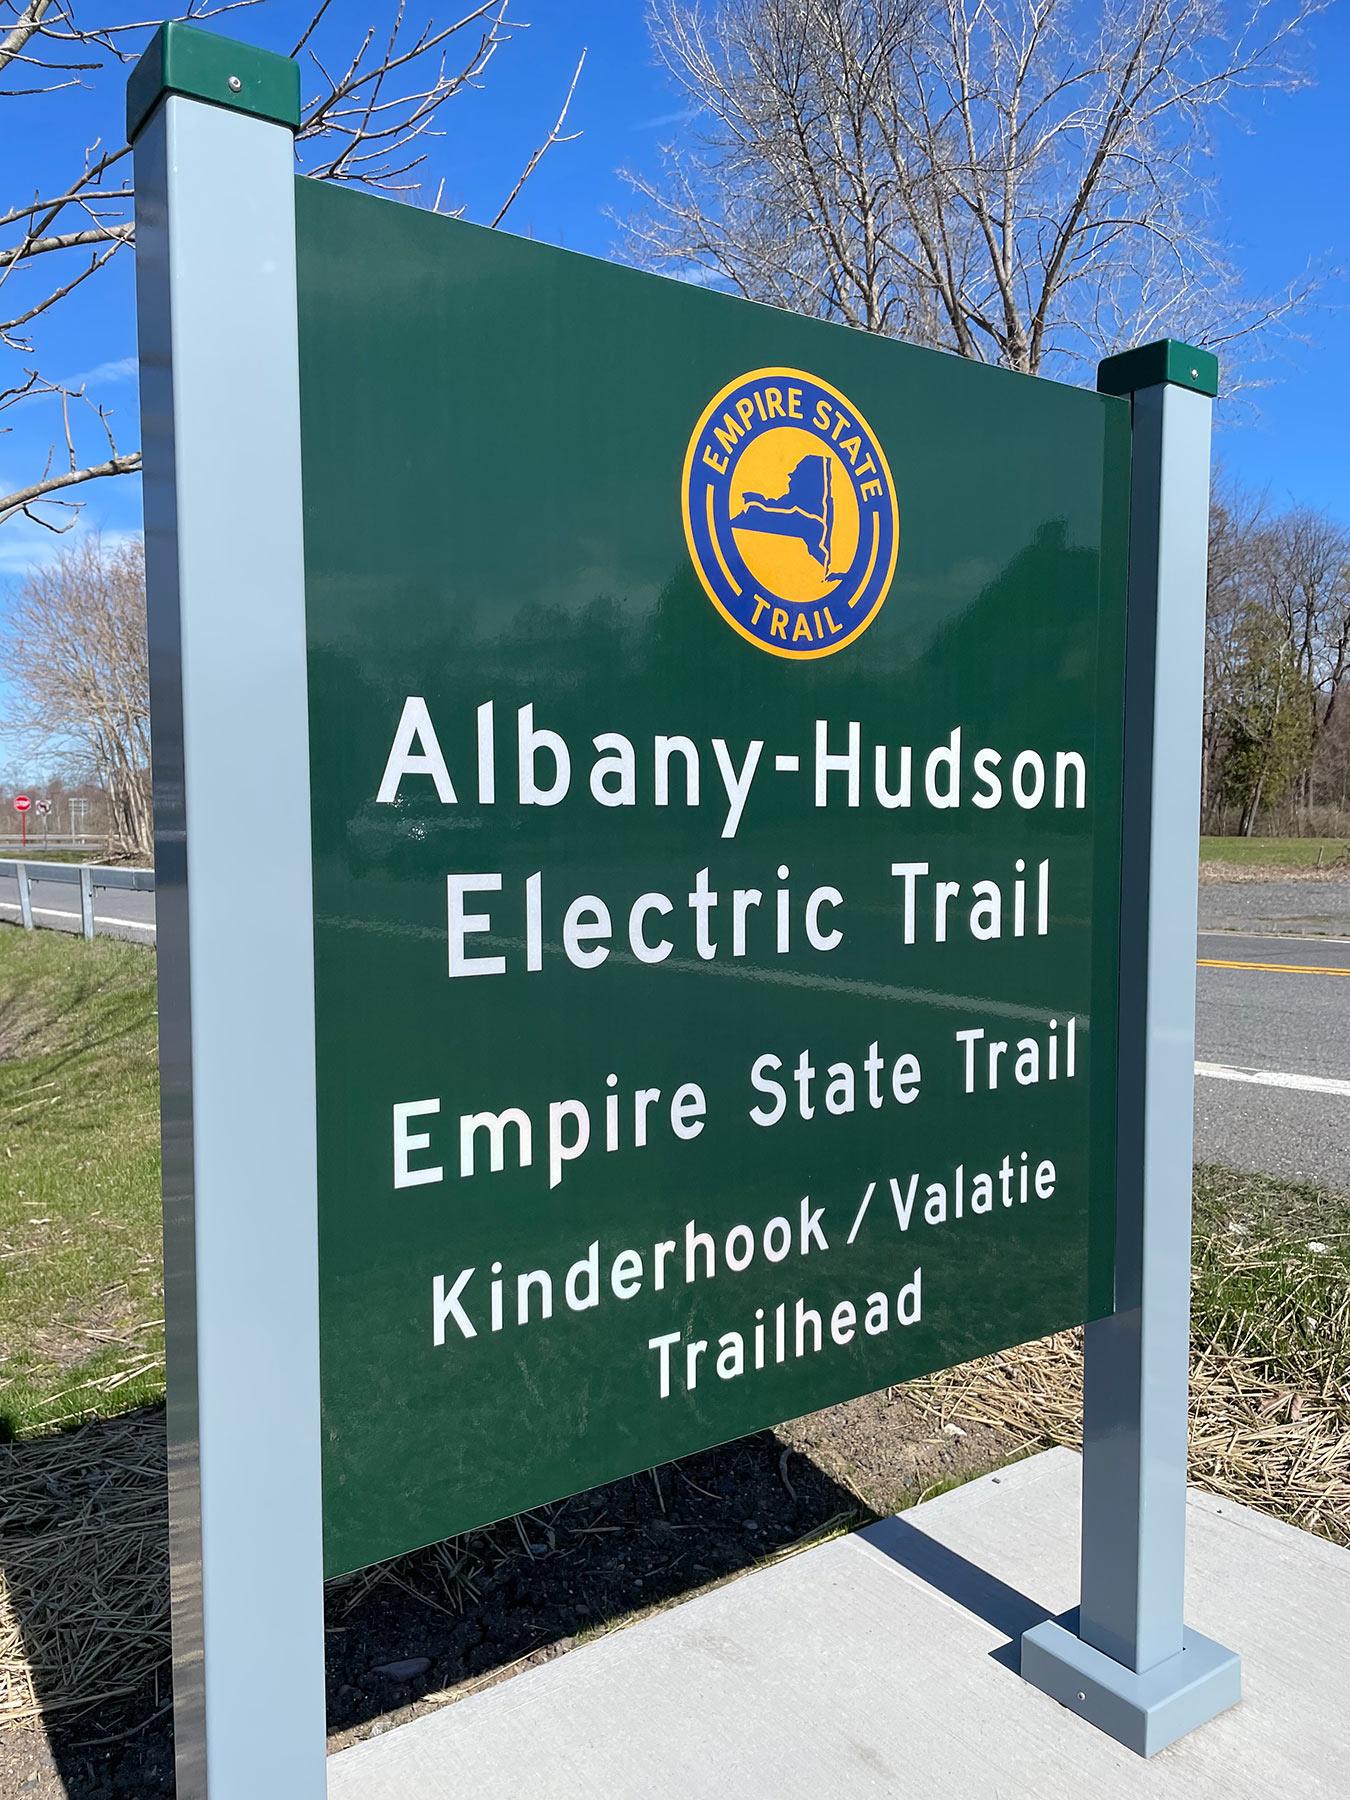 Albany-Hudson Electric Trail (Hudson to Kinderhook)